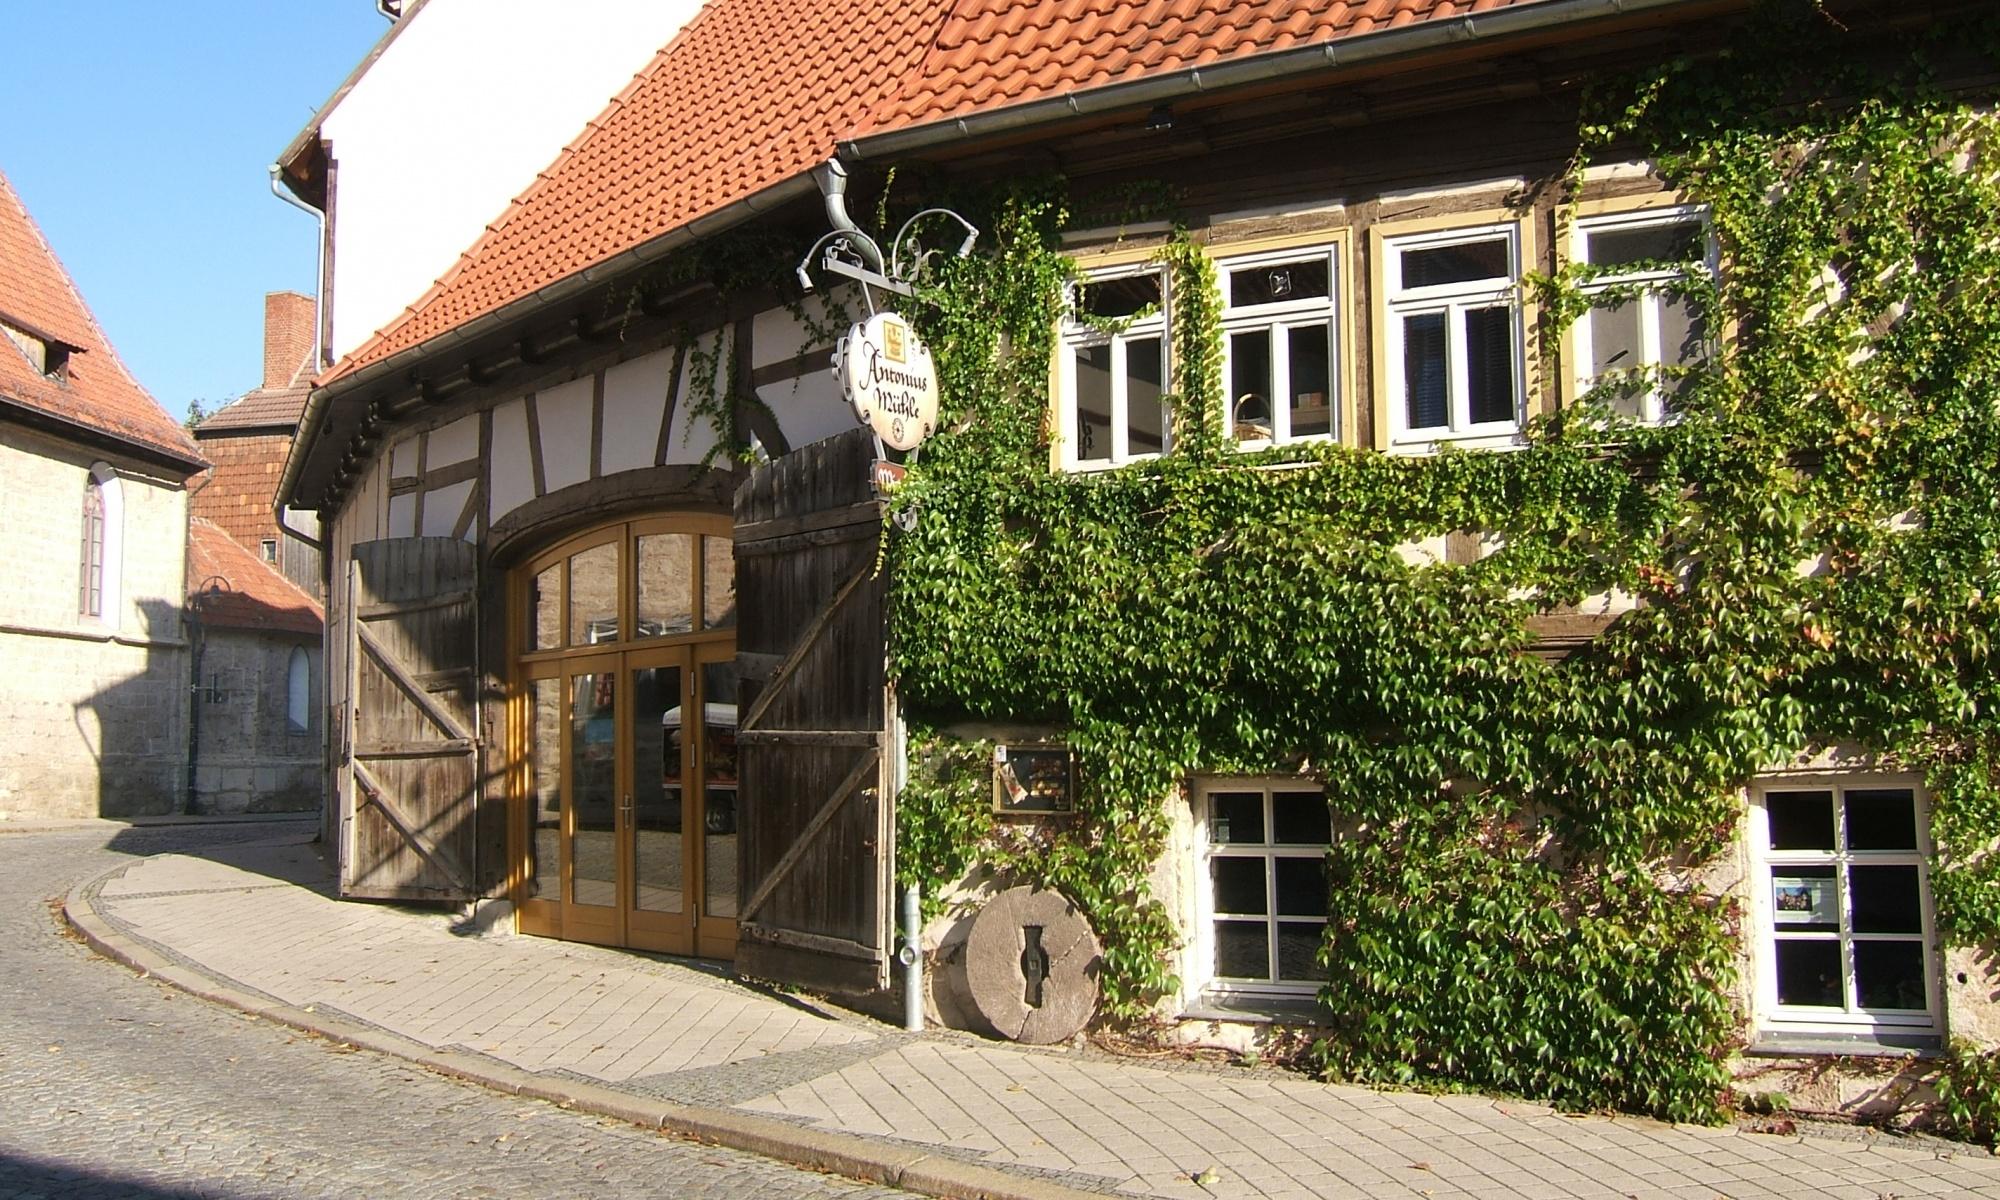 Wirtshaus Antoniusmühle